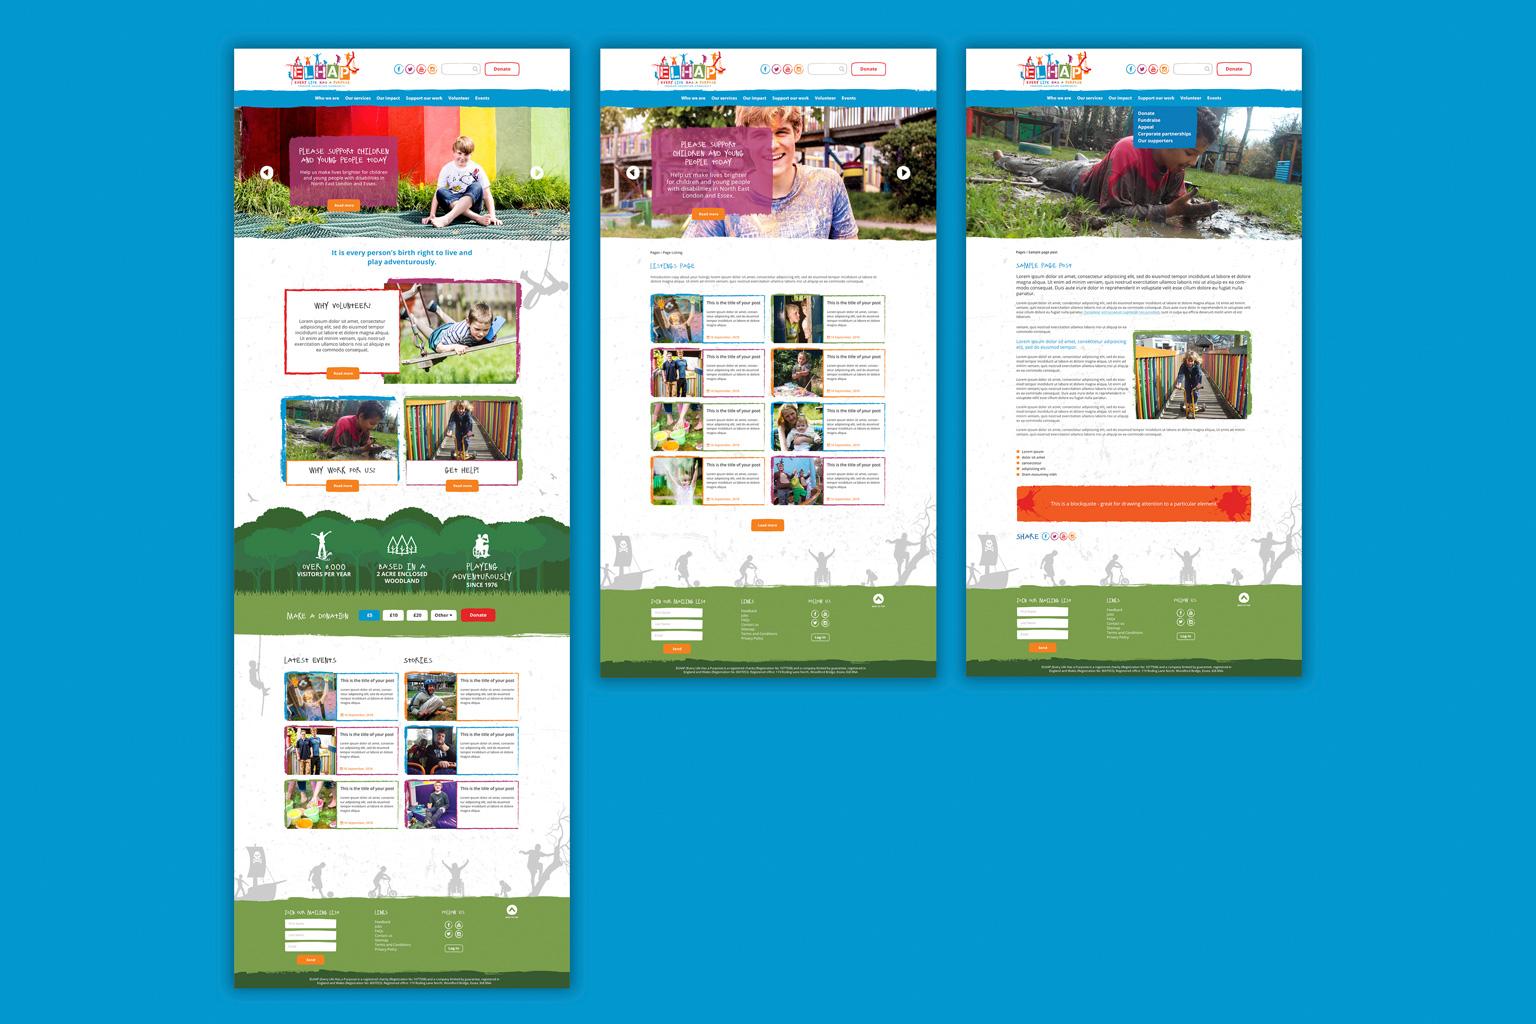 elhap-website-screens